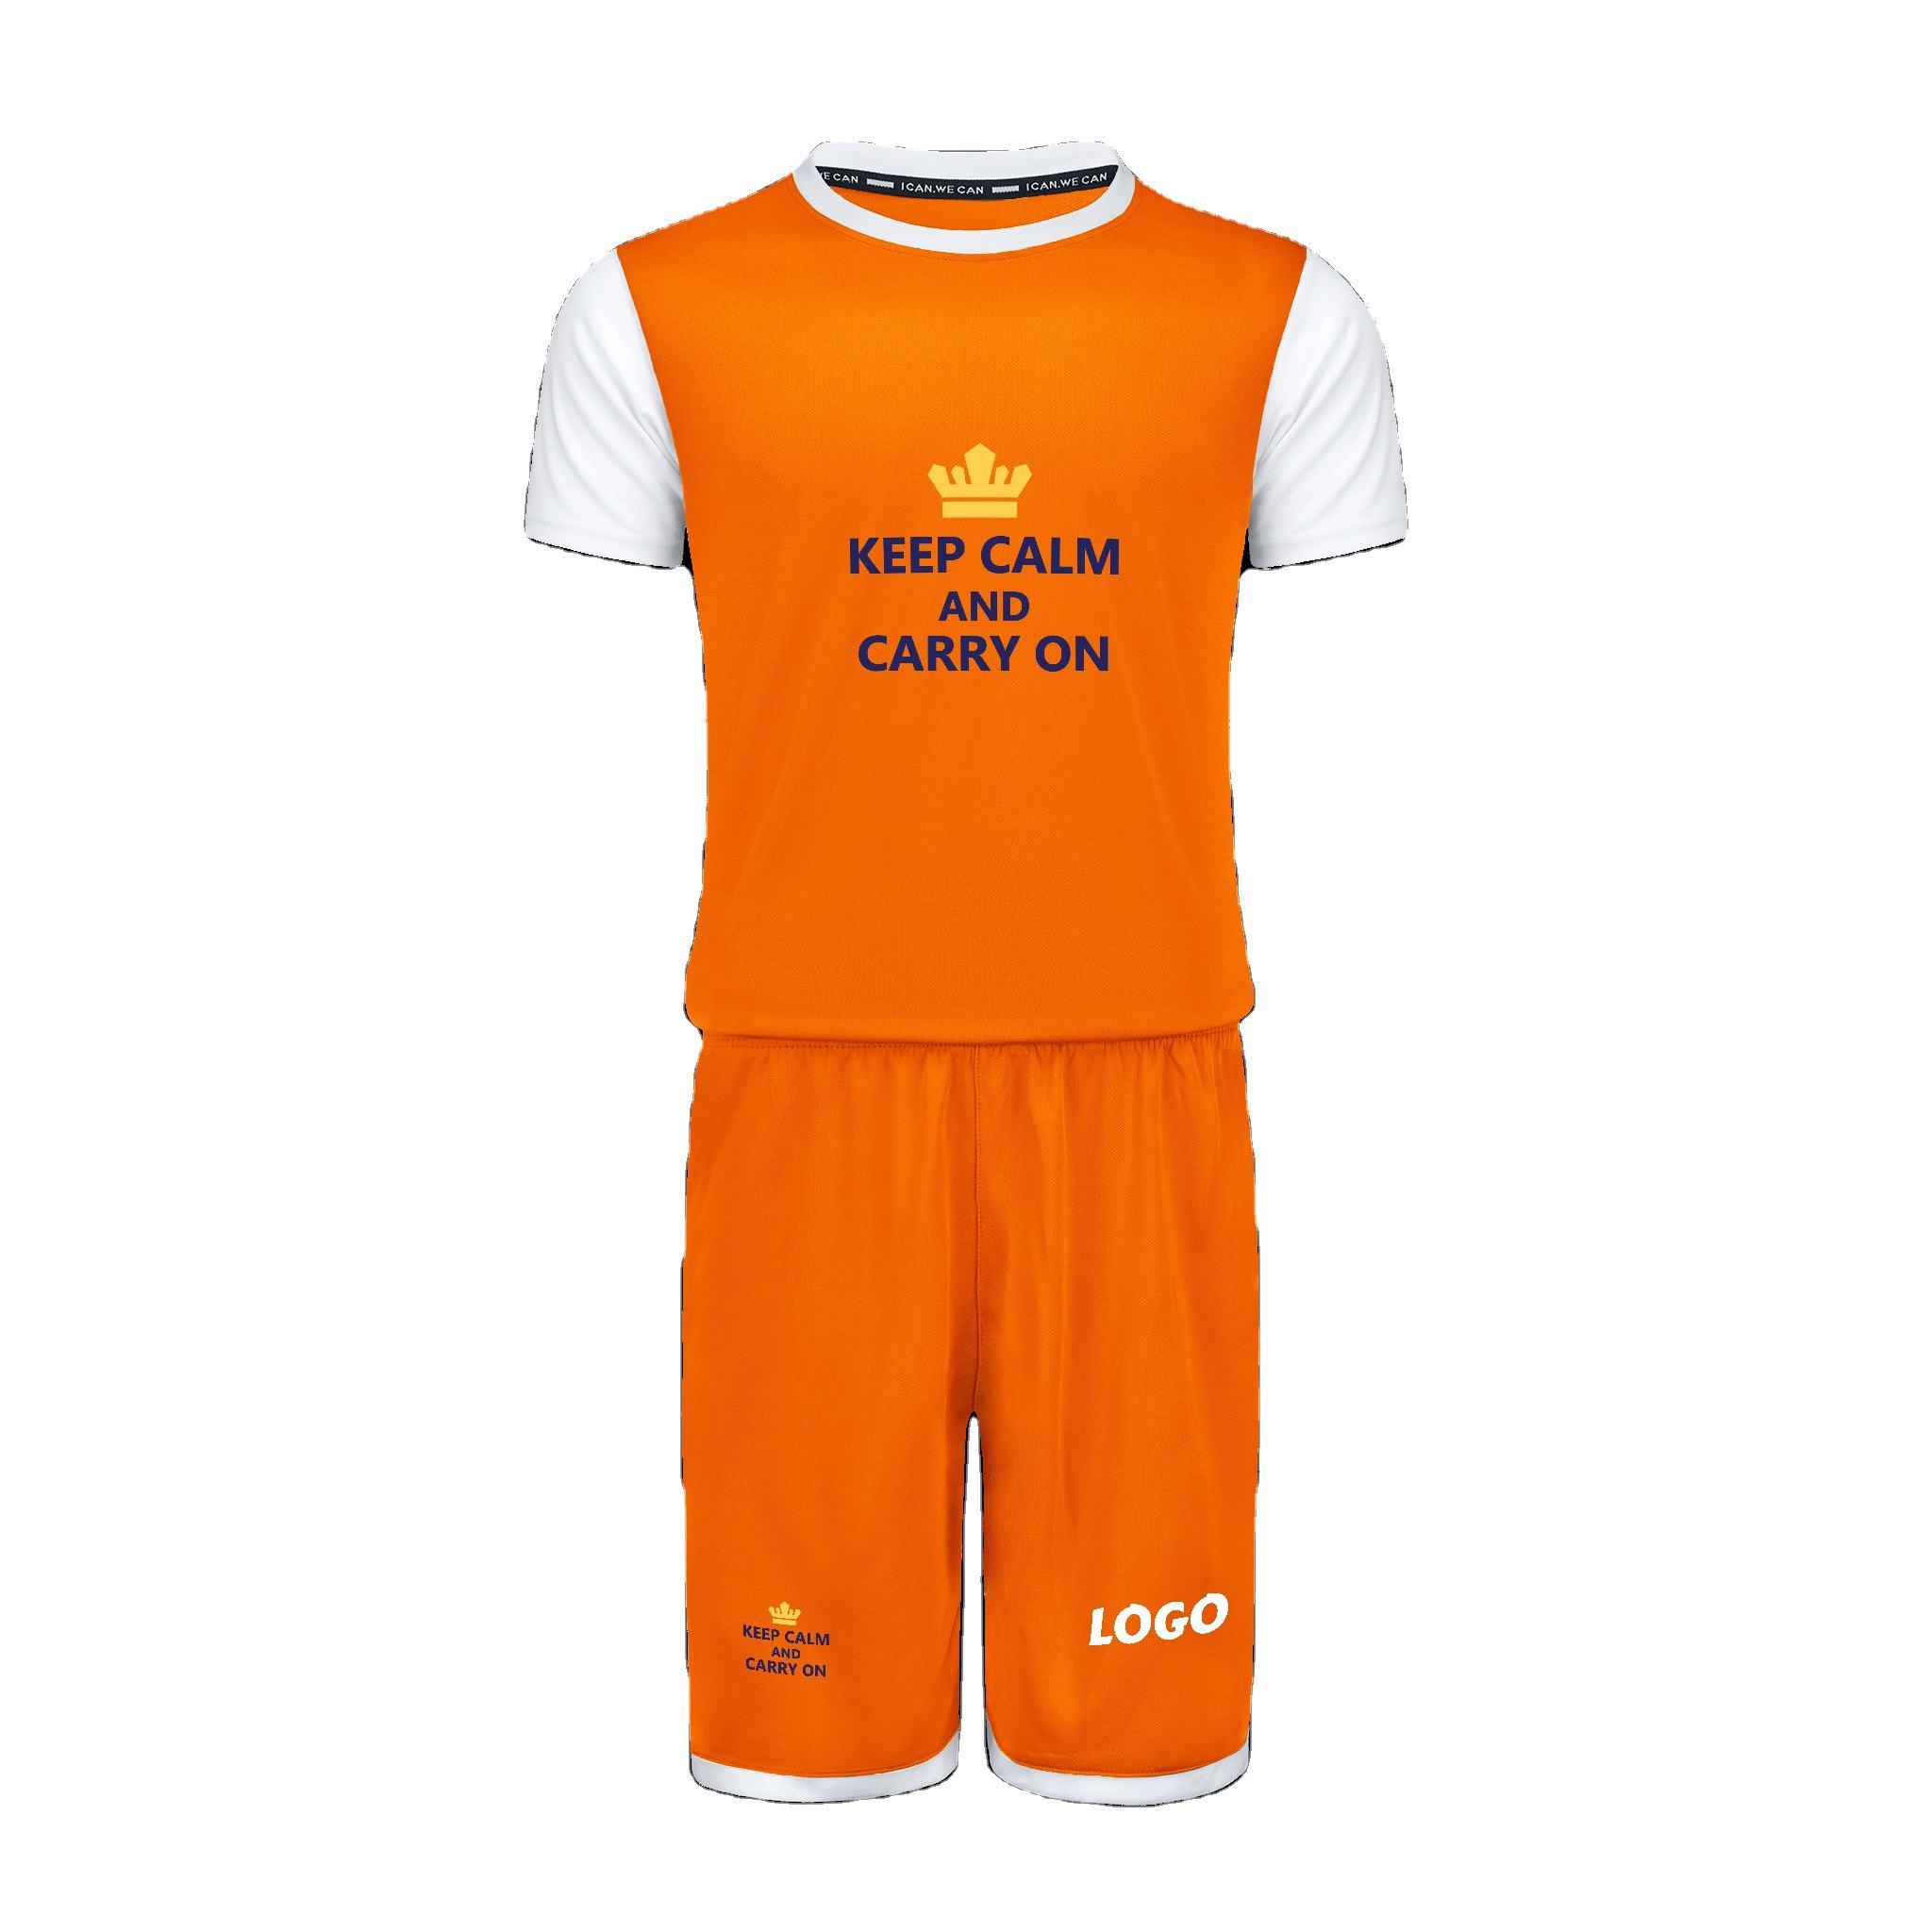 2020 new design latest men sport wear clothing custom university uniform plus size mens soccer jersey